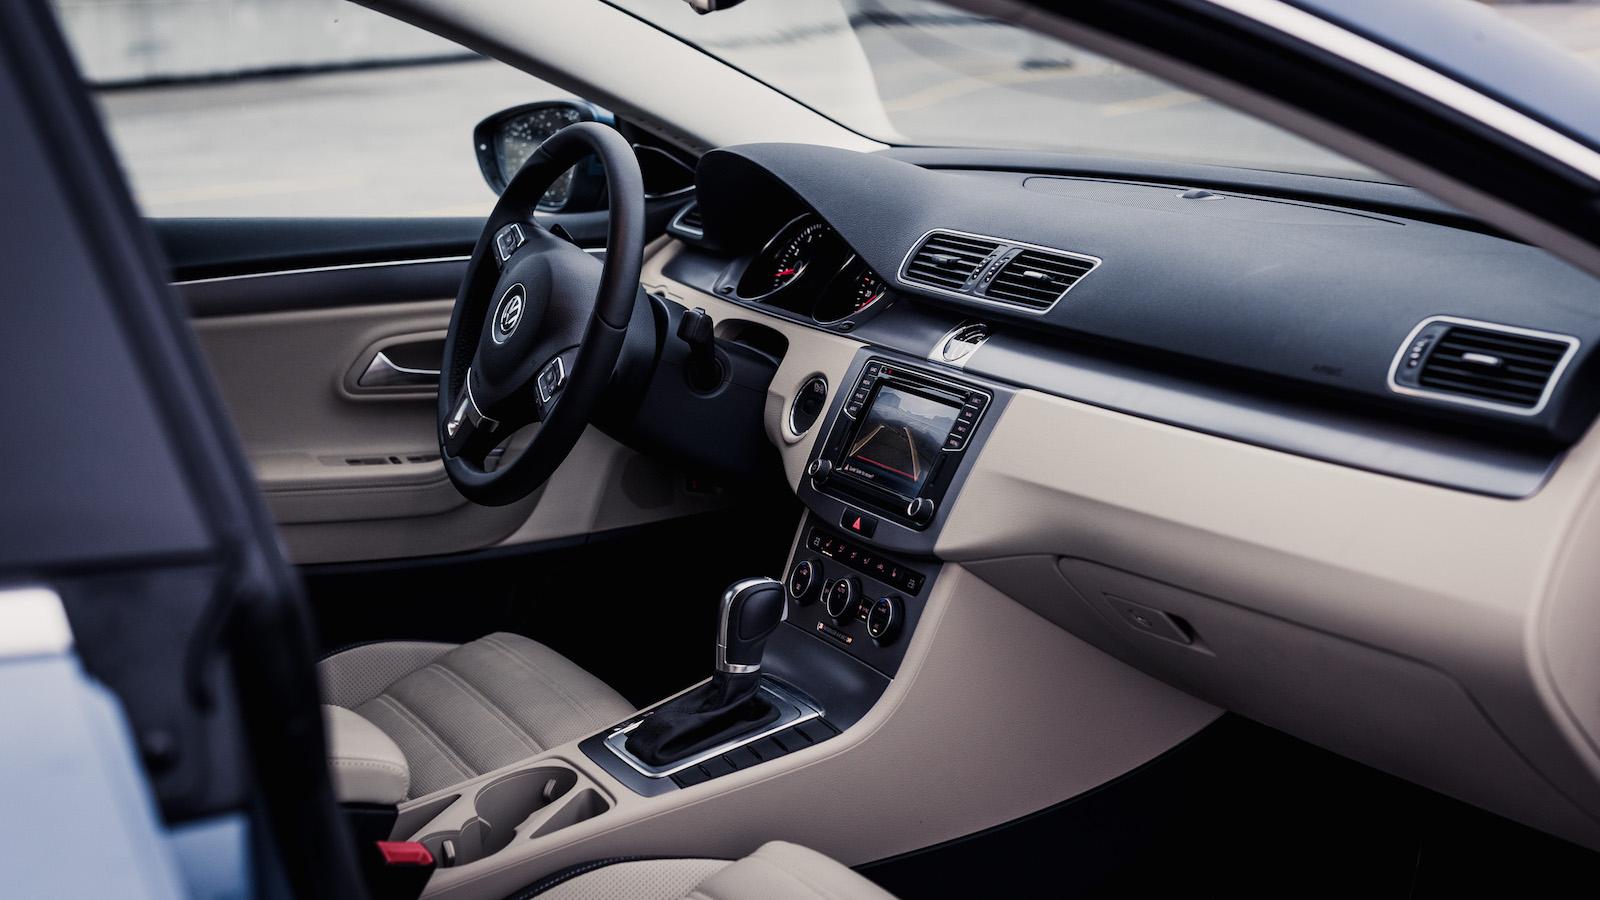 sedan seat notebook volkswagen editors limited automobile interior cc magazine lux front vw luxury news